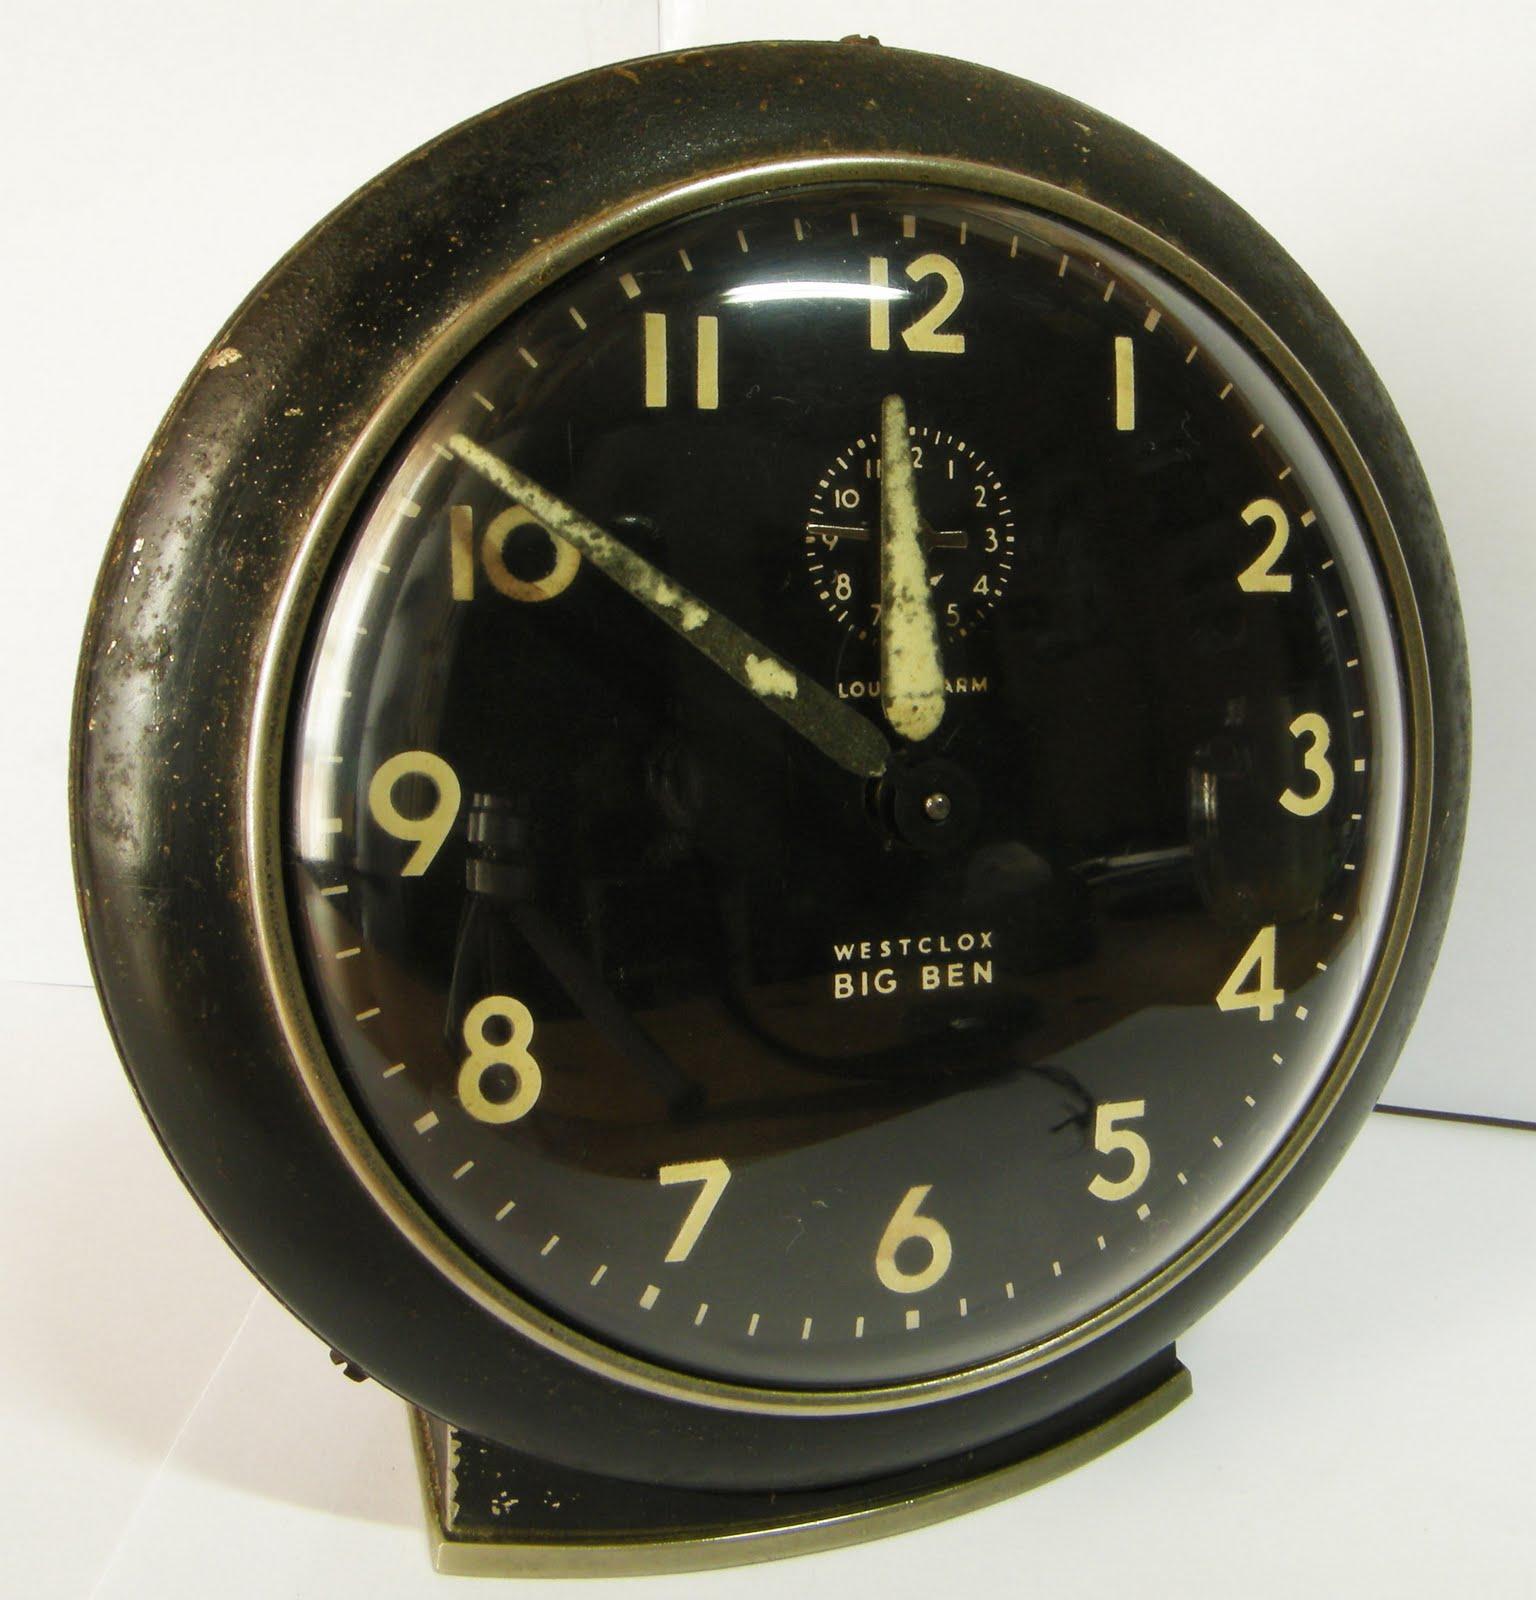 Project Repair Project Westclox Big Ben Alarm Clock Style 6 33